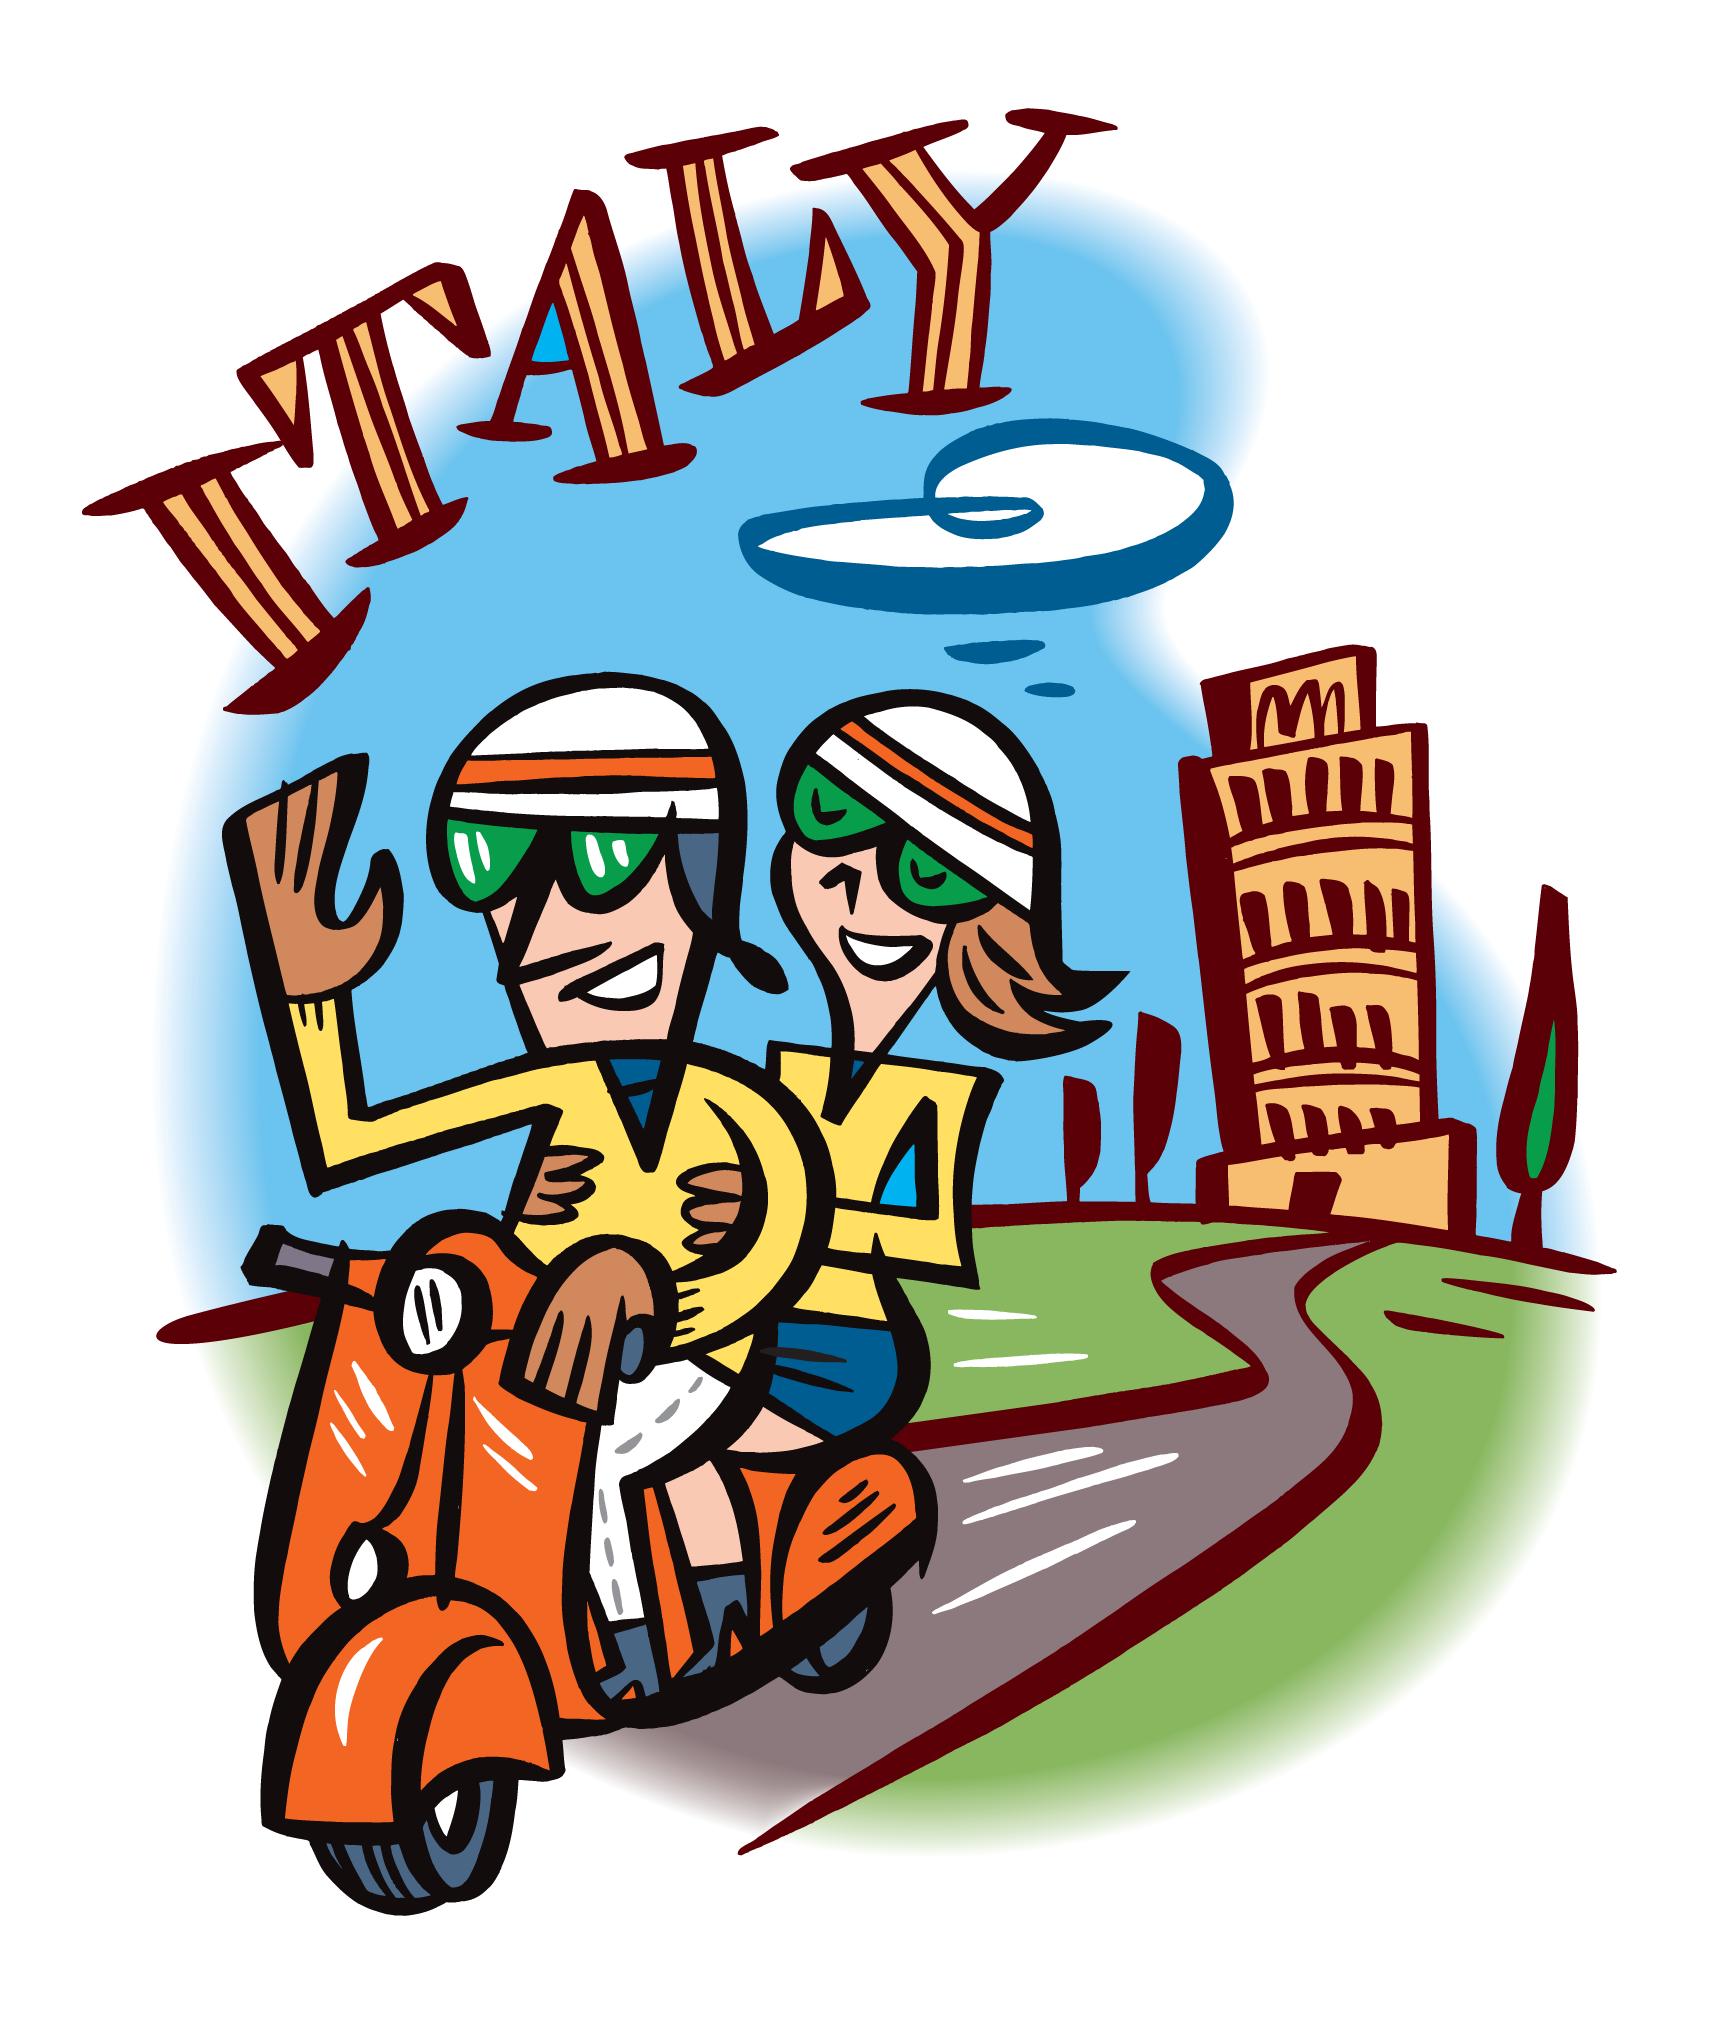 Italy Travel Guide: Asahi Bank, Japan